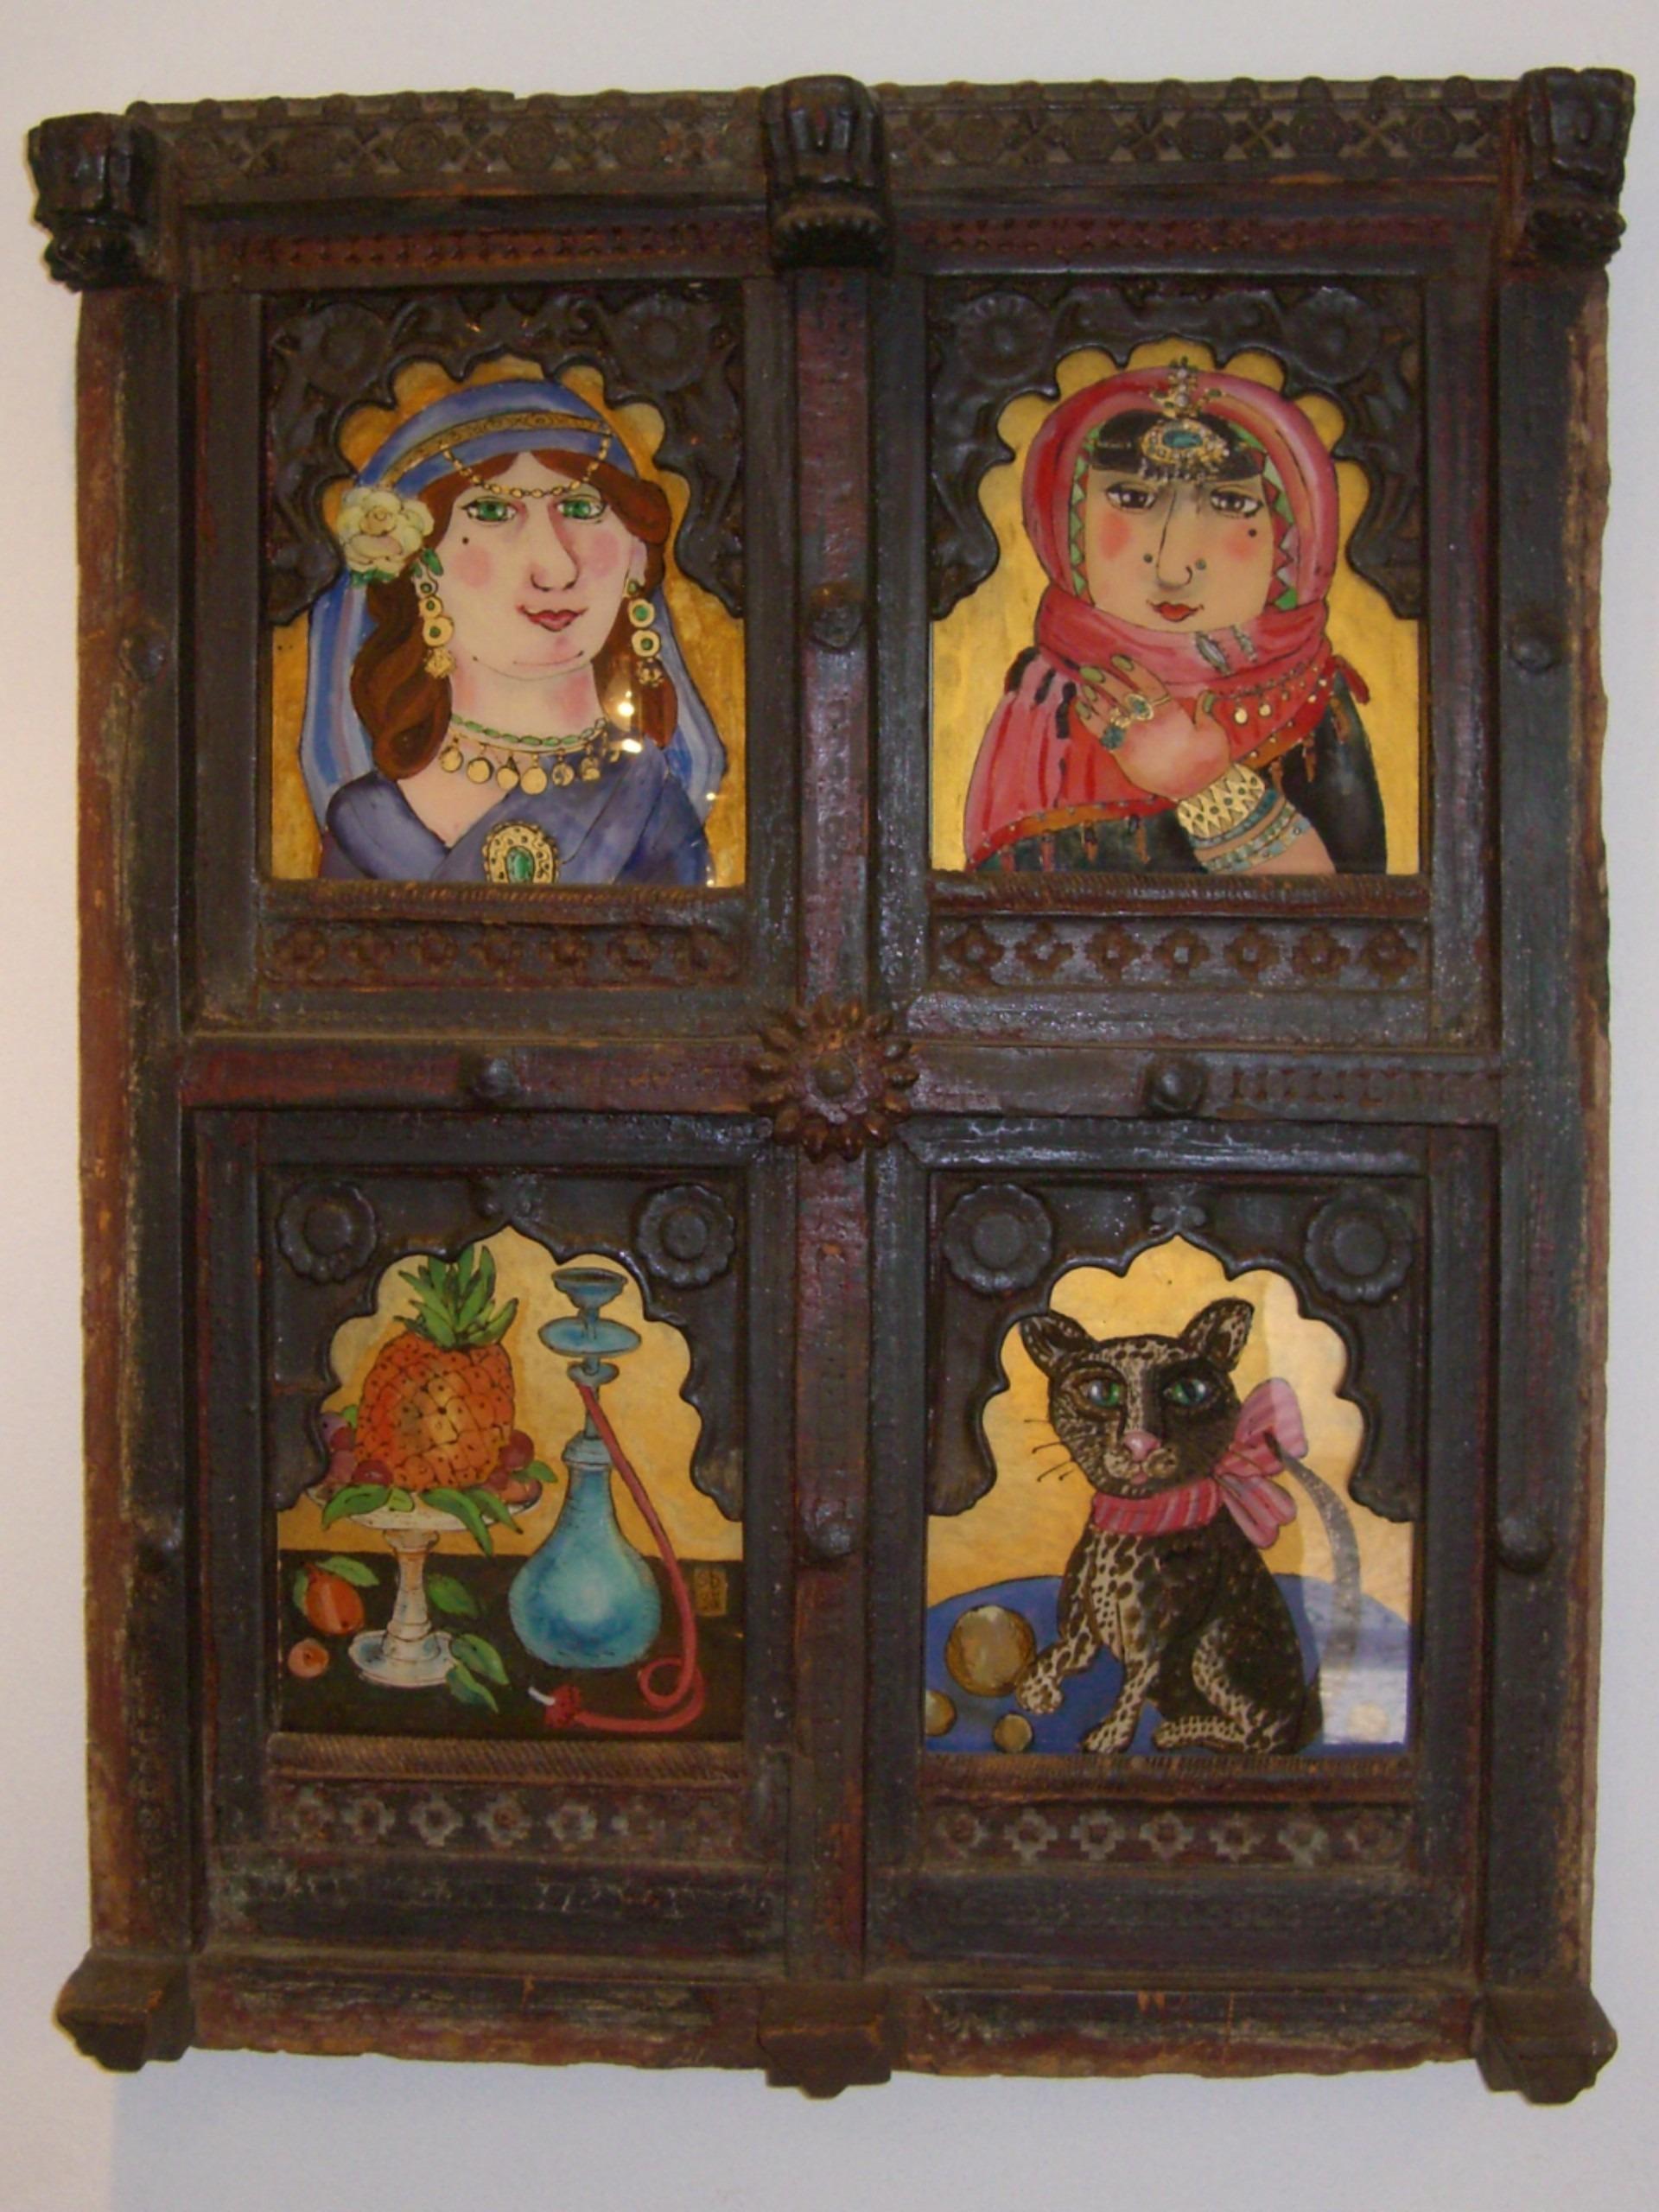 Fotos gratis : madera, antiguo, ventana, marco, mueble, vistoso ...